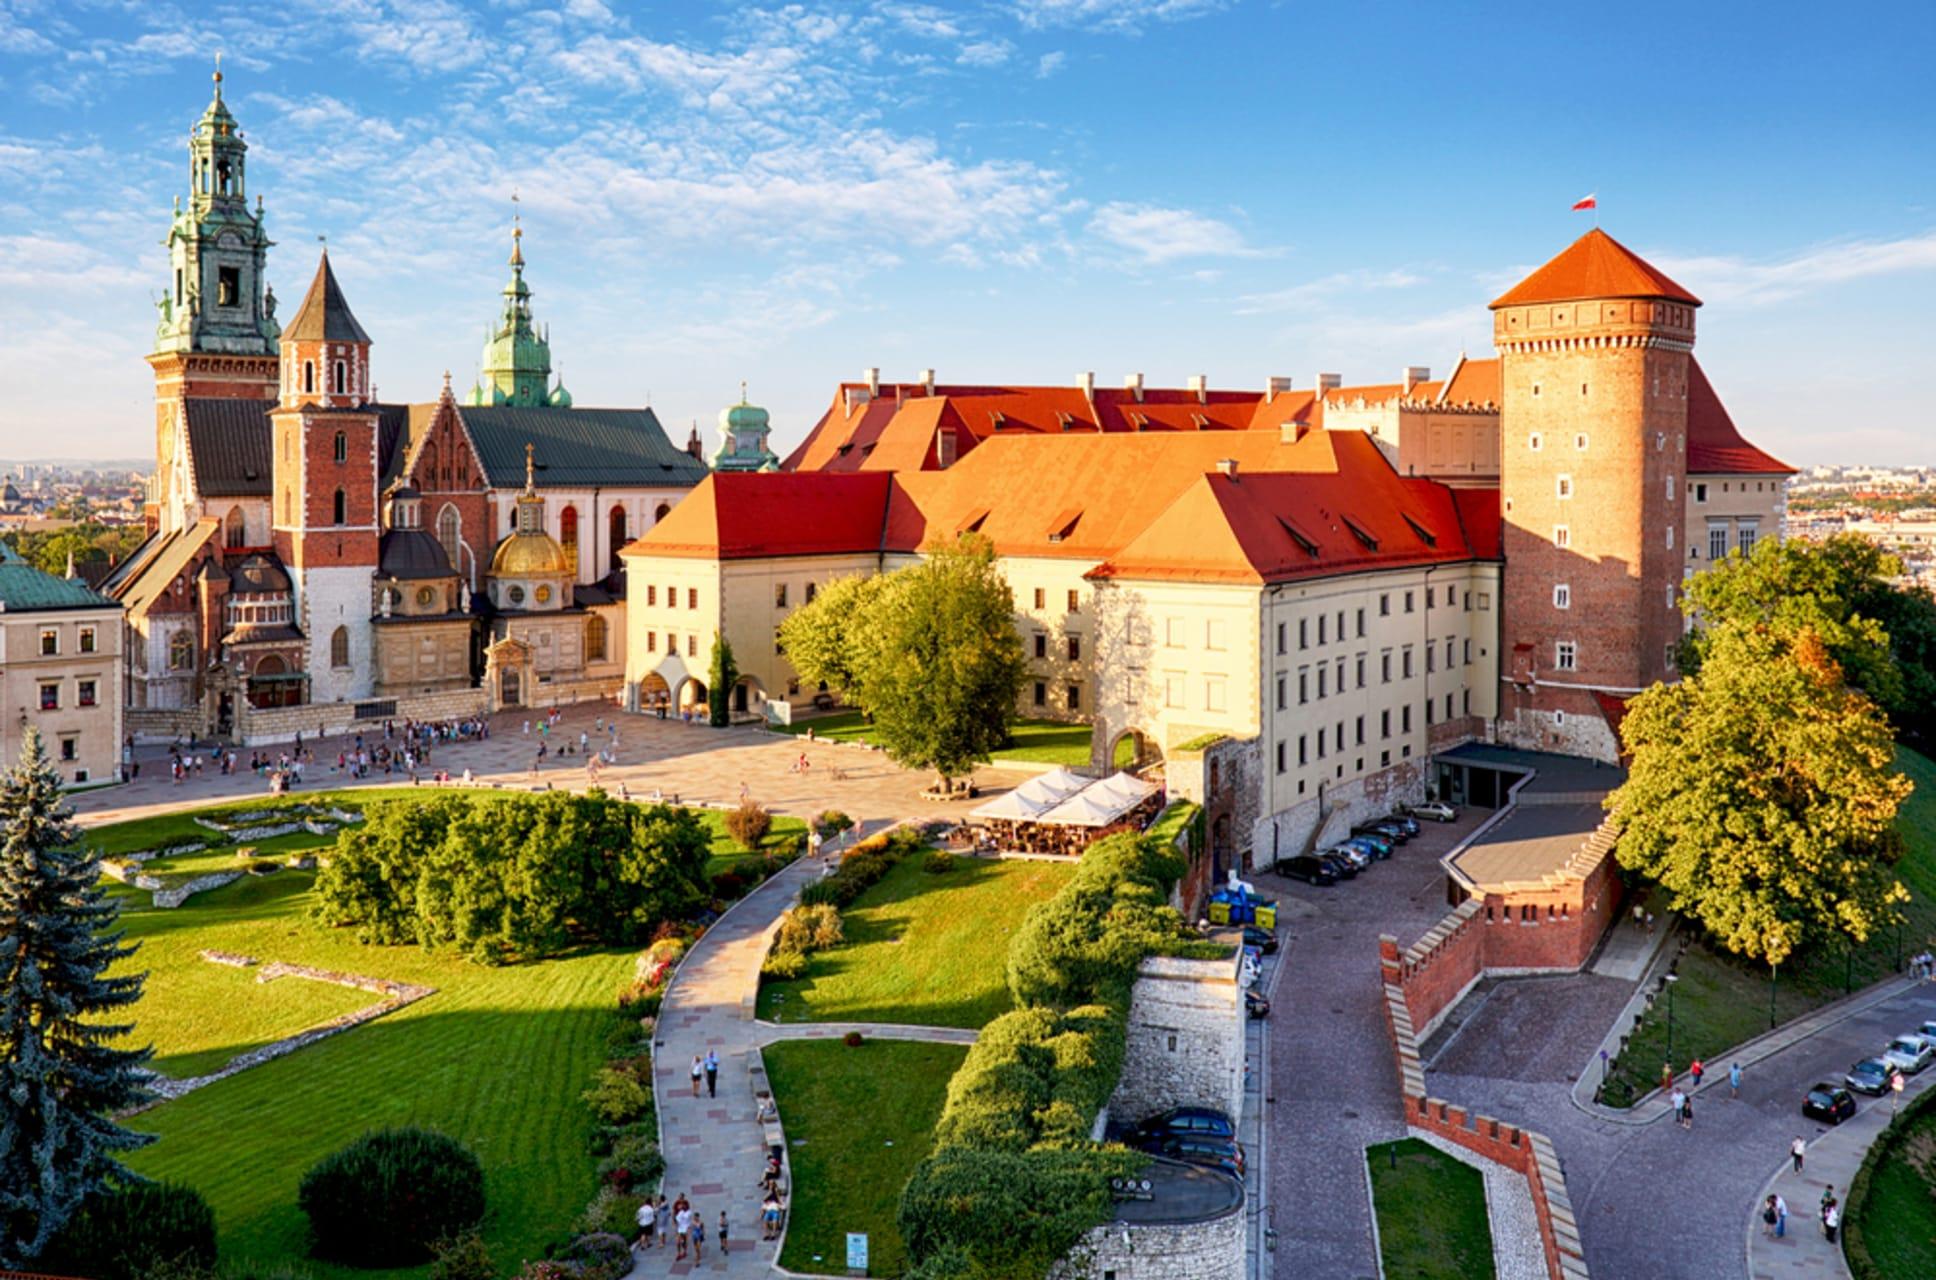 Krakow - Kraków - The Secret Capital of Poland